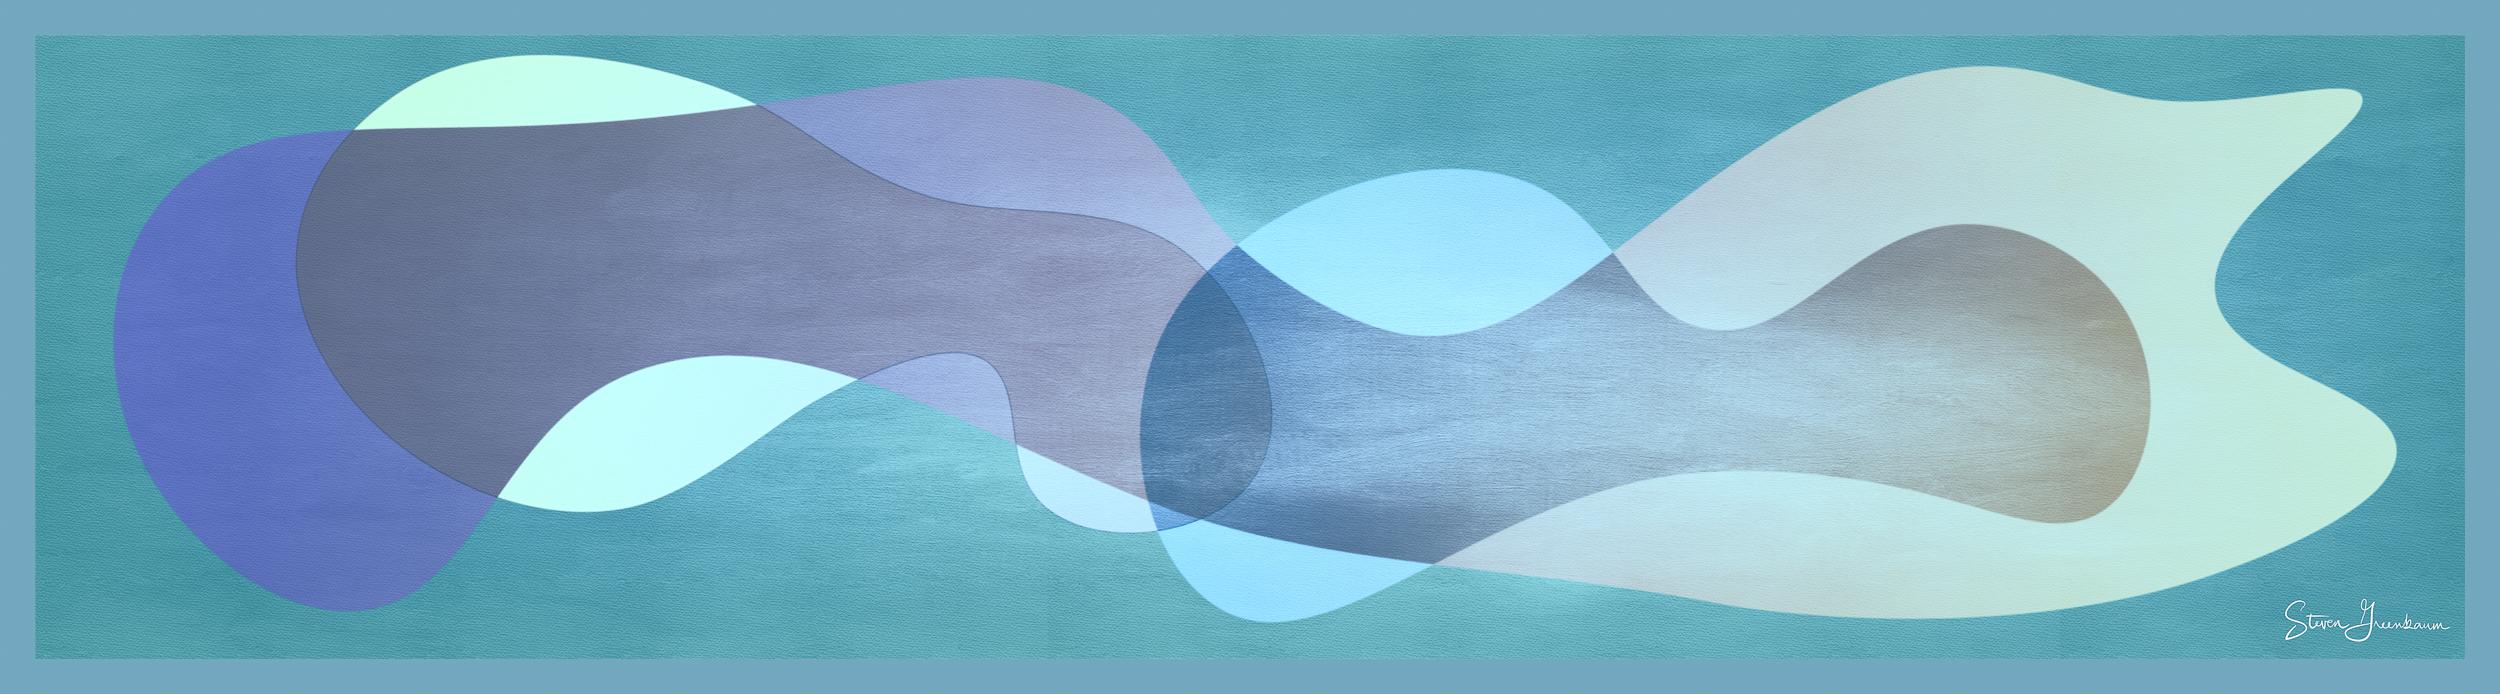 triptych-var 1 a-Edit-Edit-36x10-maya blue glaze-Edit.jpg